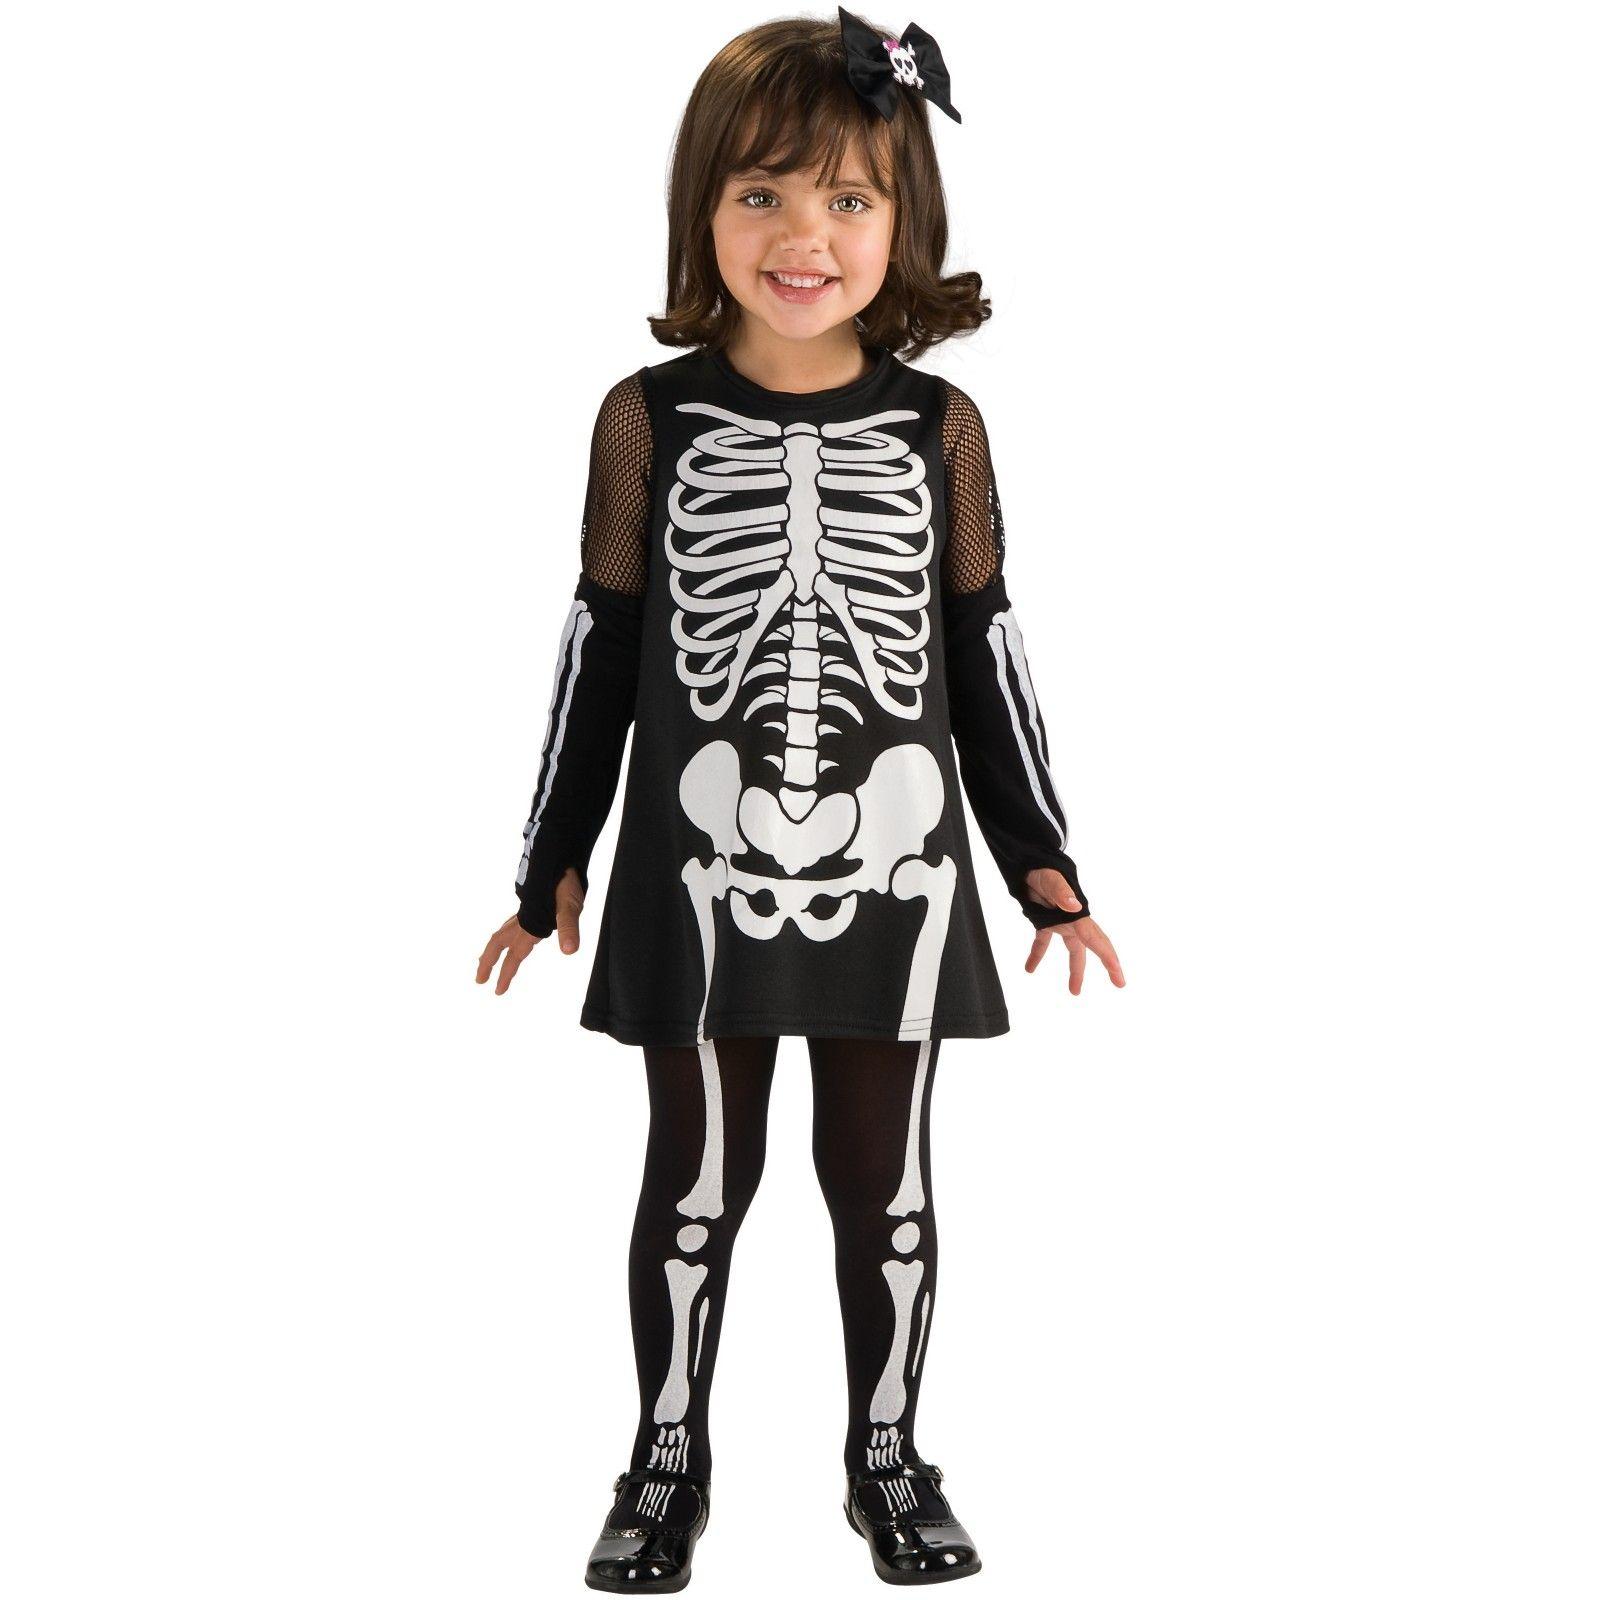 Skeleton Itty Bitty Bones Toddler Costume